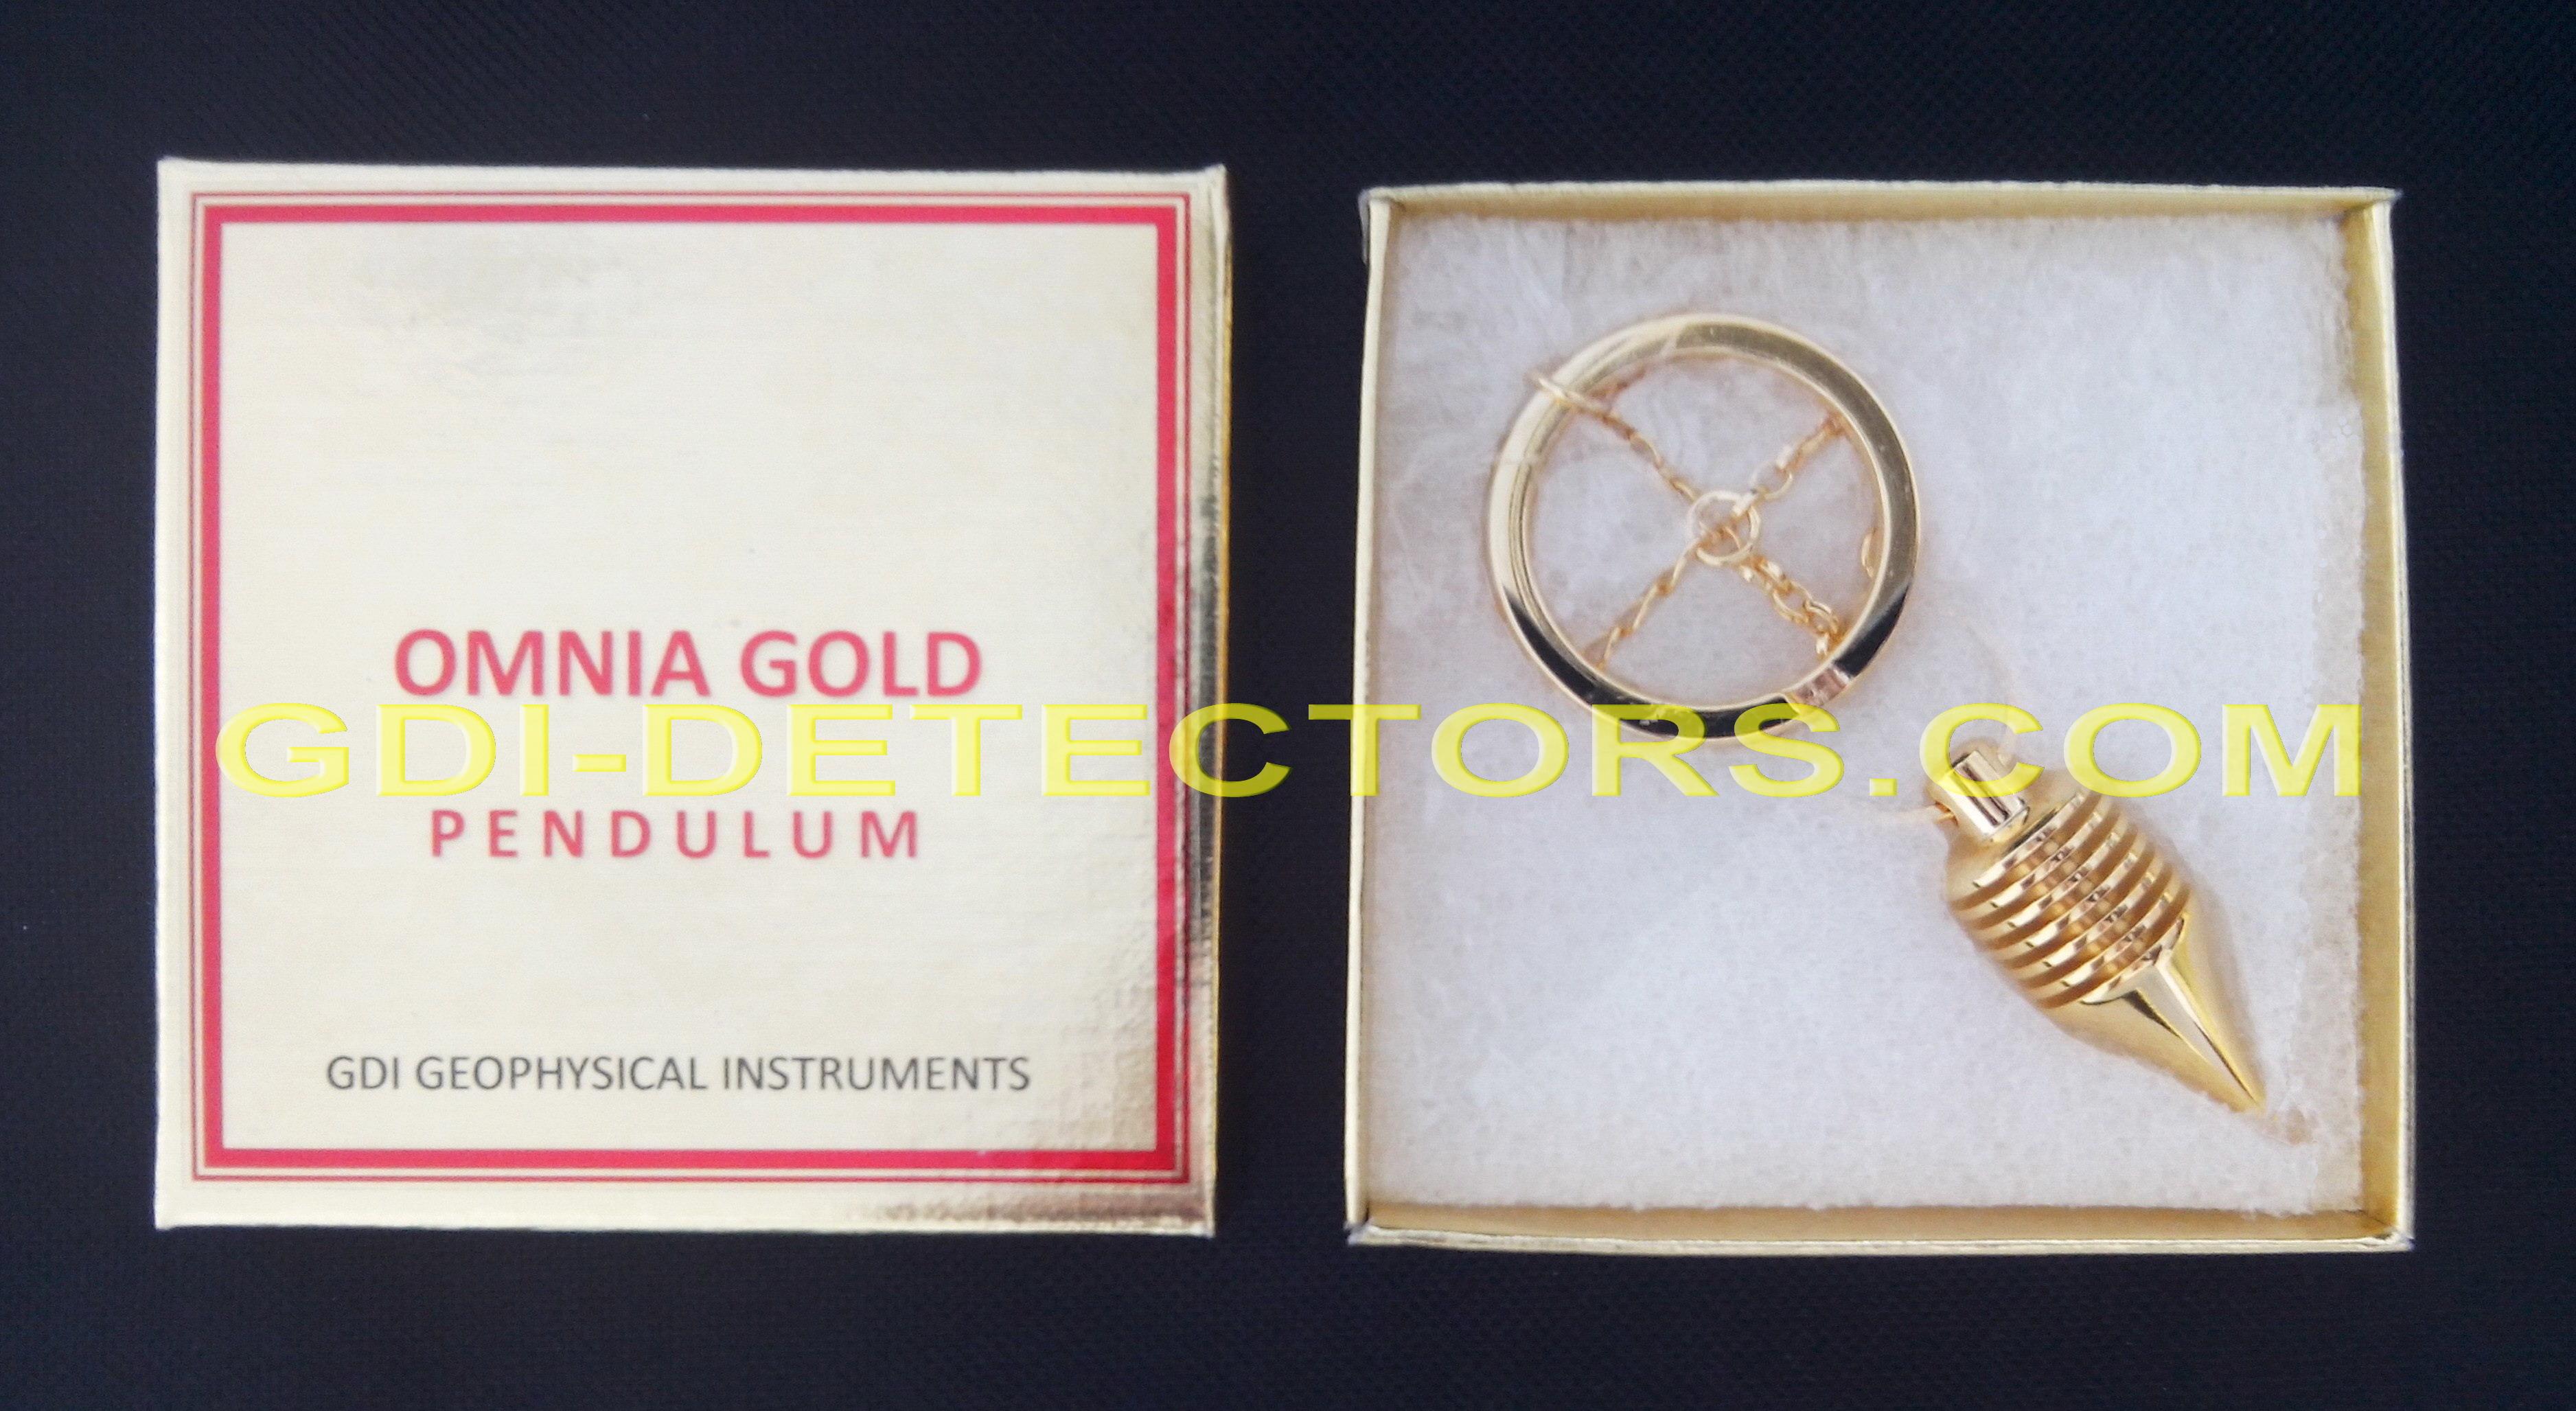 OMNIA gold dowsing pendulum by GDI